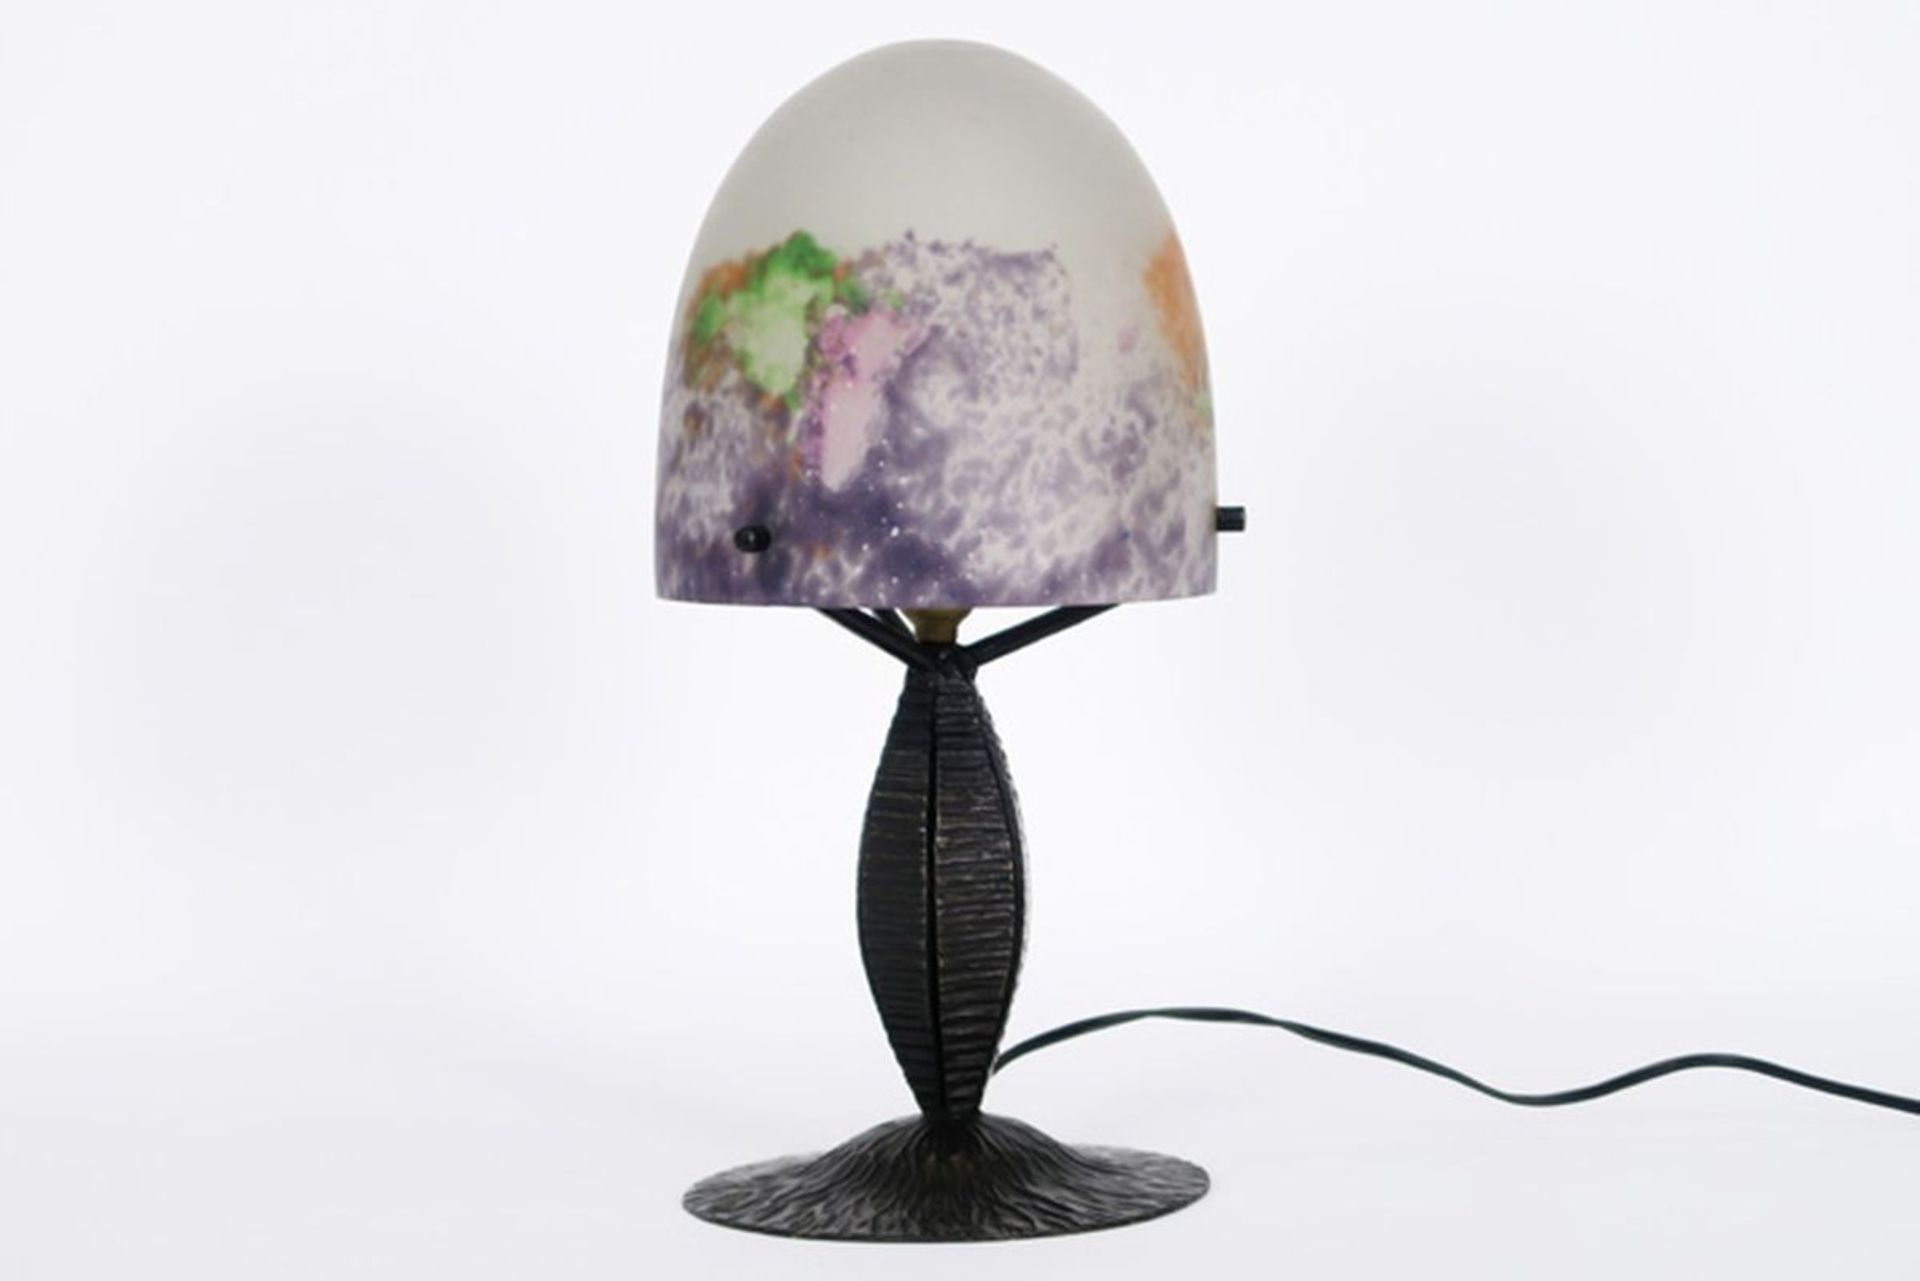 Los 615 - MÜLLER frêres LUNEVILLE champignonvormige Art Deco-lamp met voet en kap in [...]